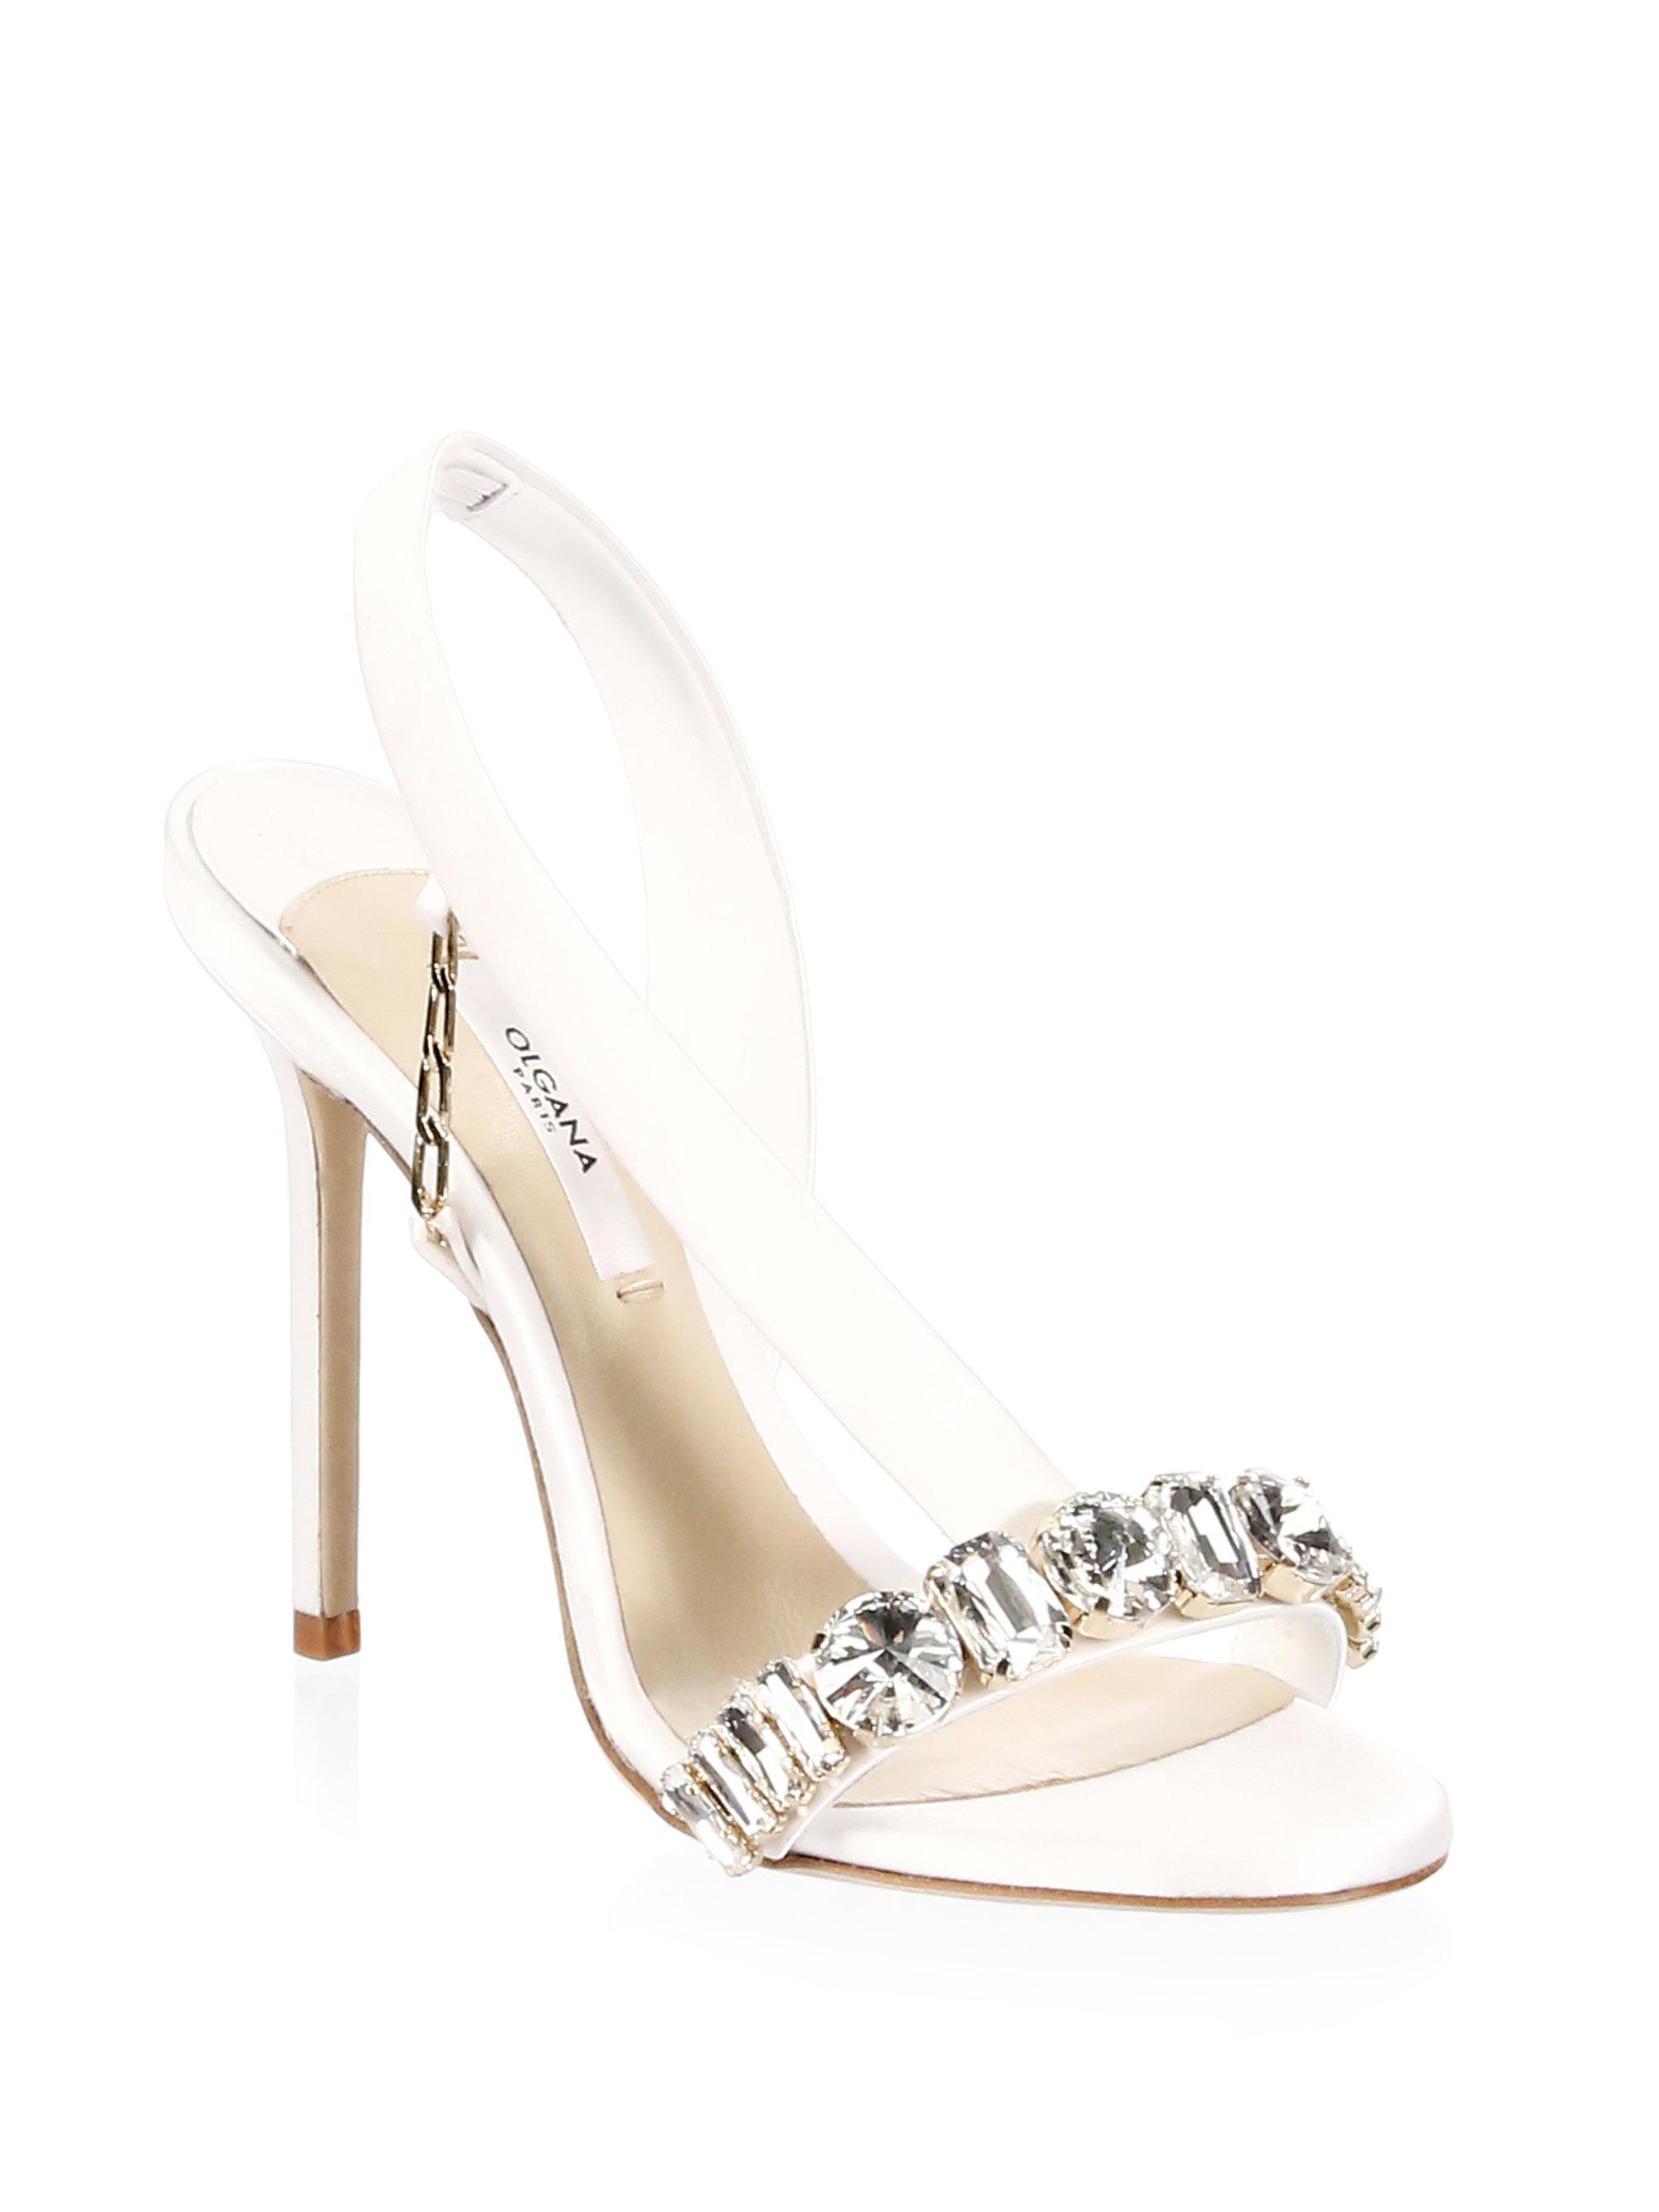 385ccf3c3 Lyst - Olgana Paris Jeweled Satin Pumps in White